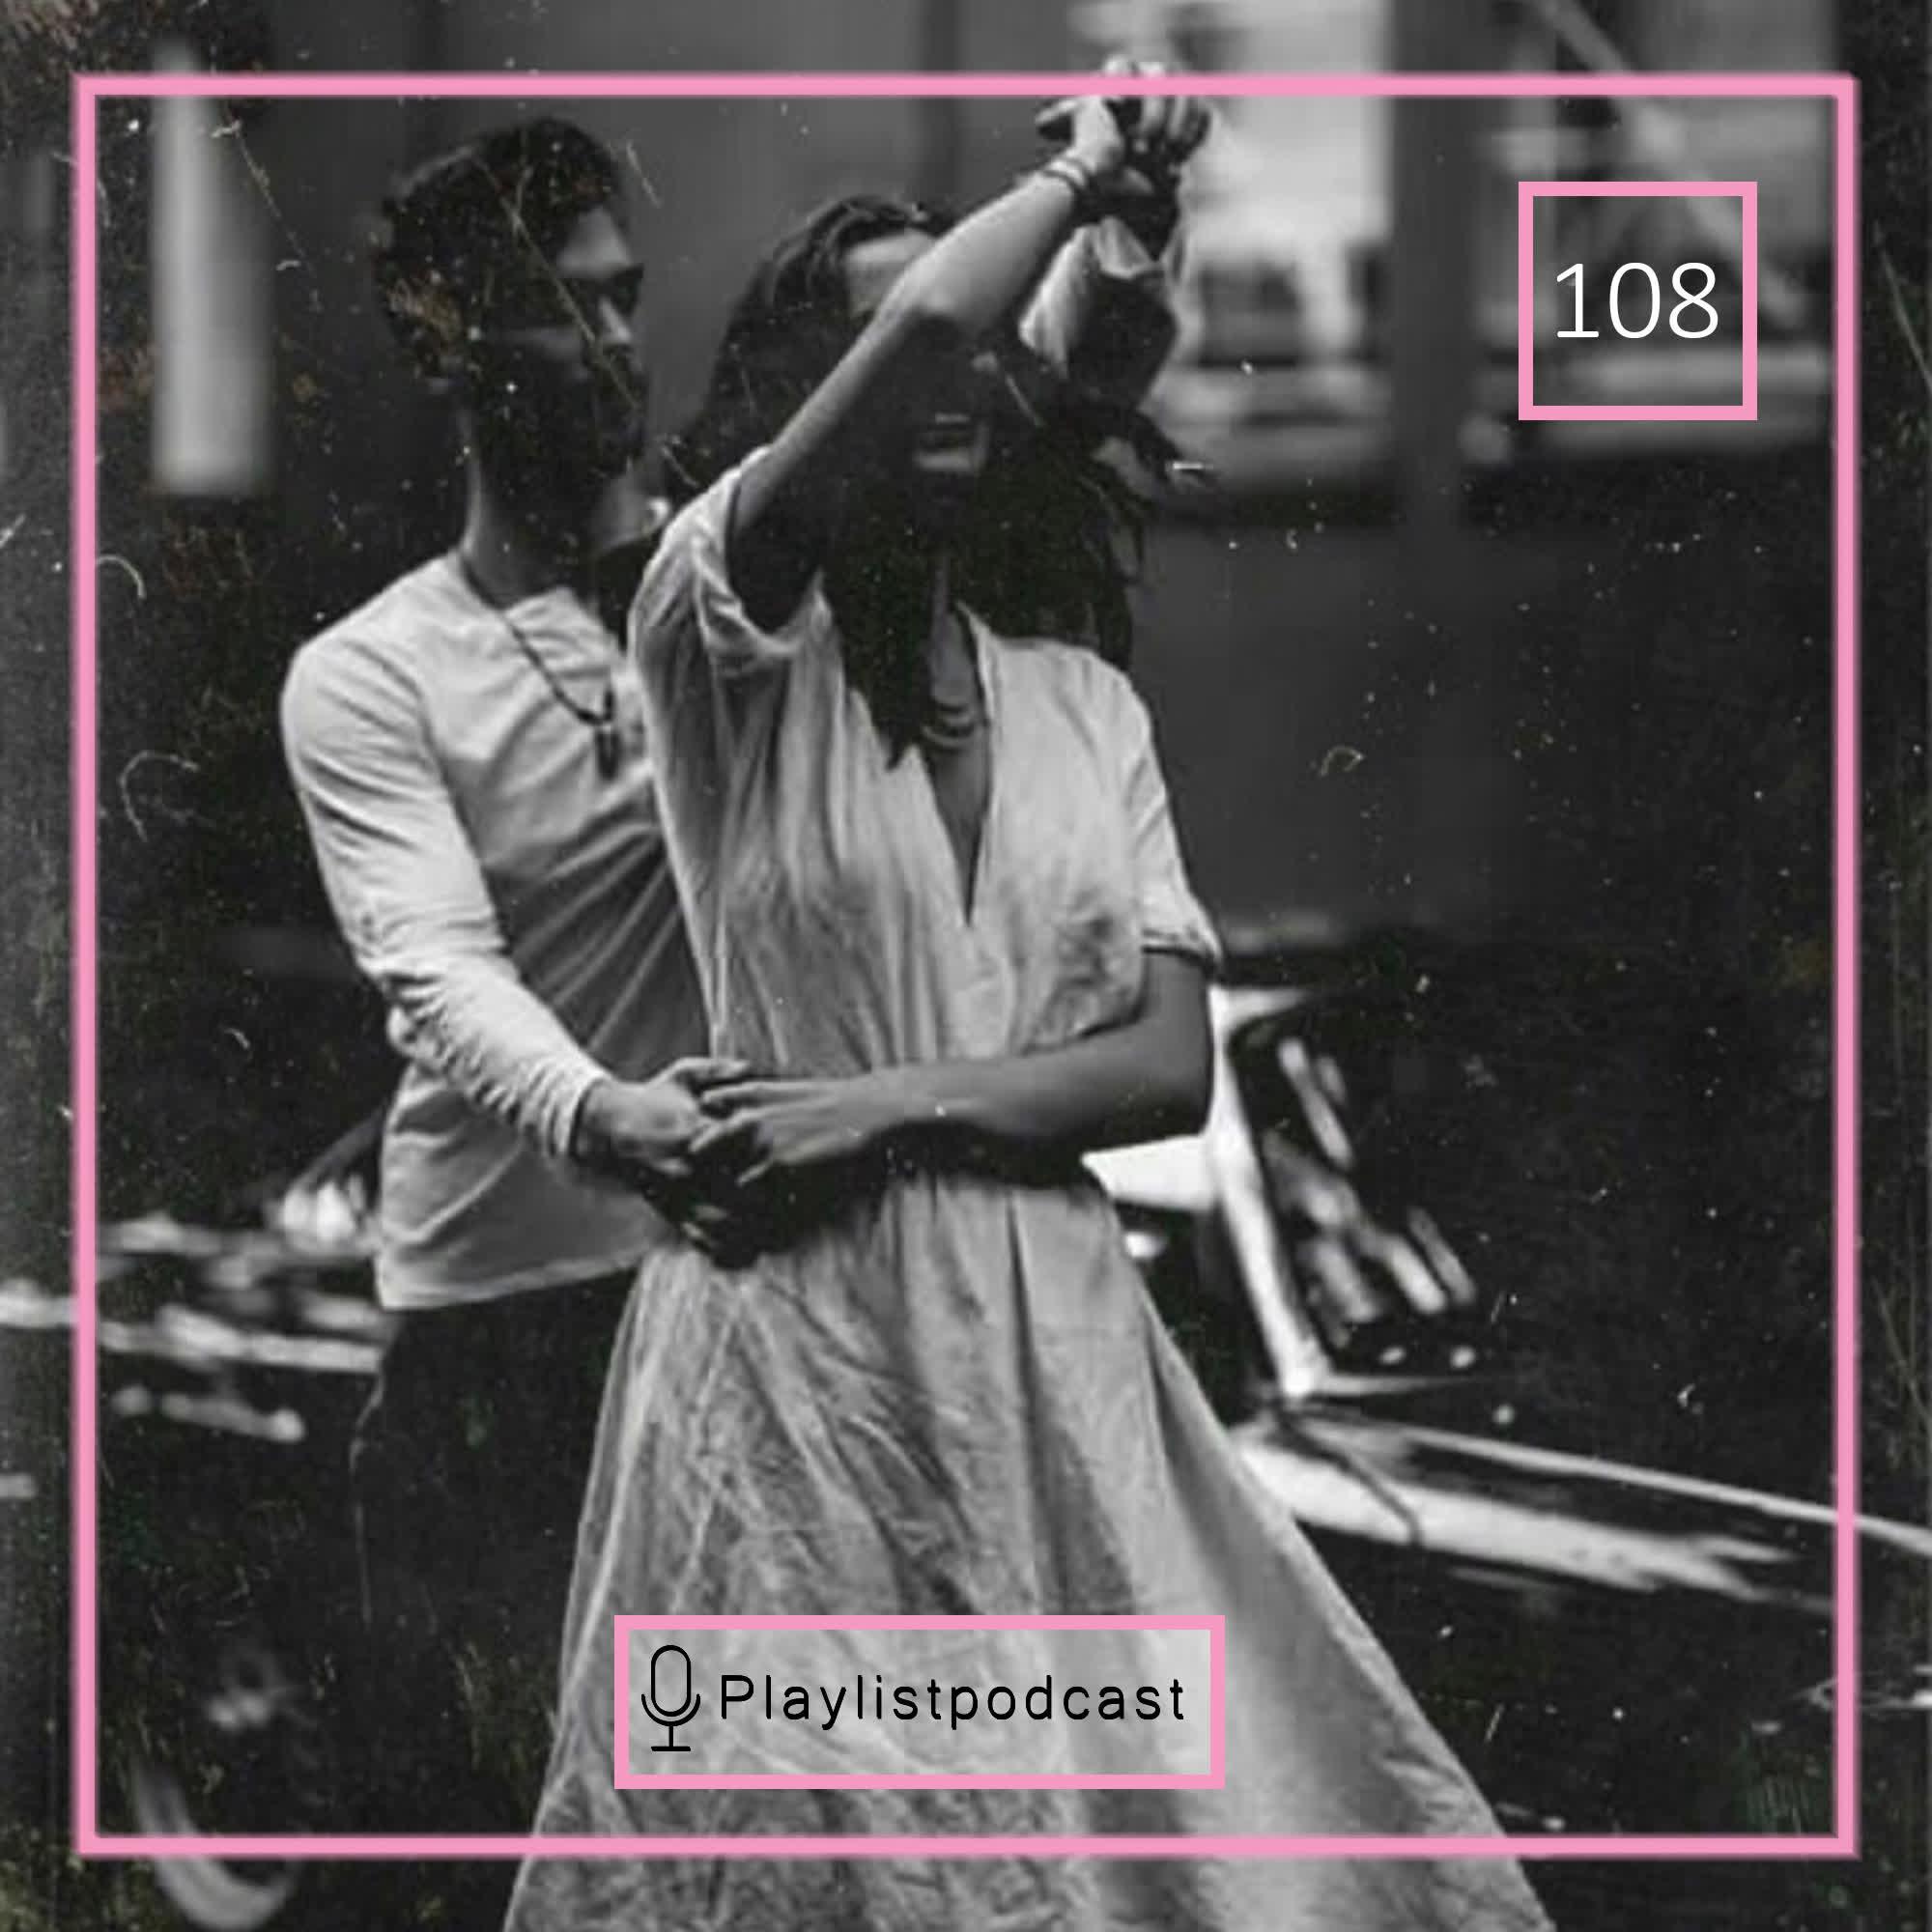 LIVE 108 - پلی لیست لایو - قرن بیستم با طعم عشق